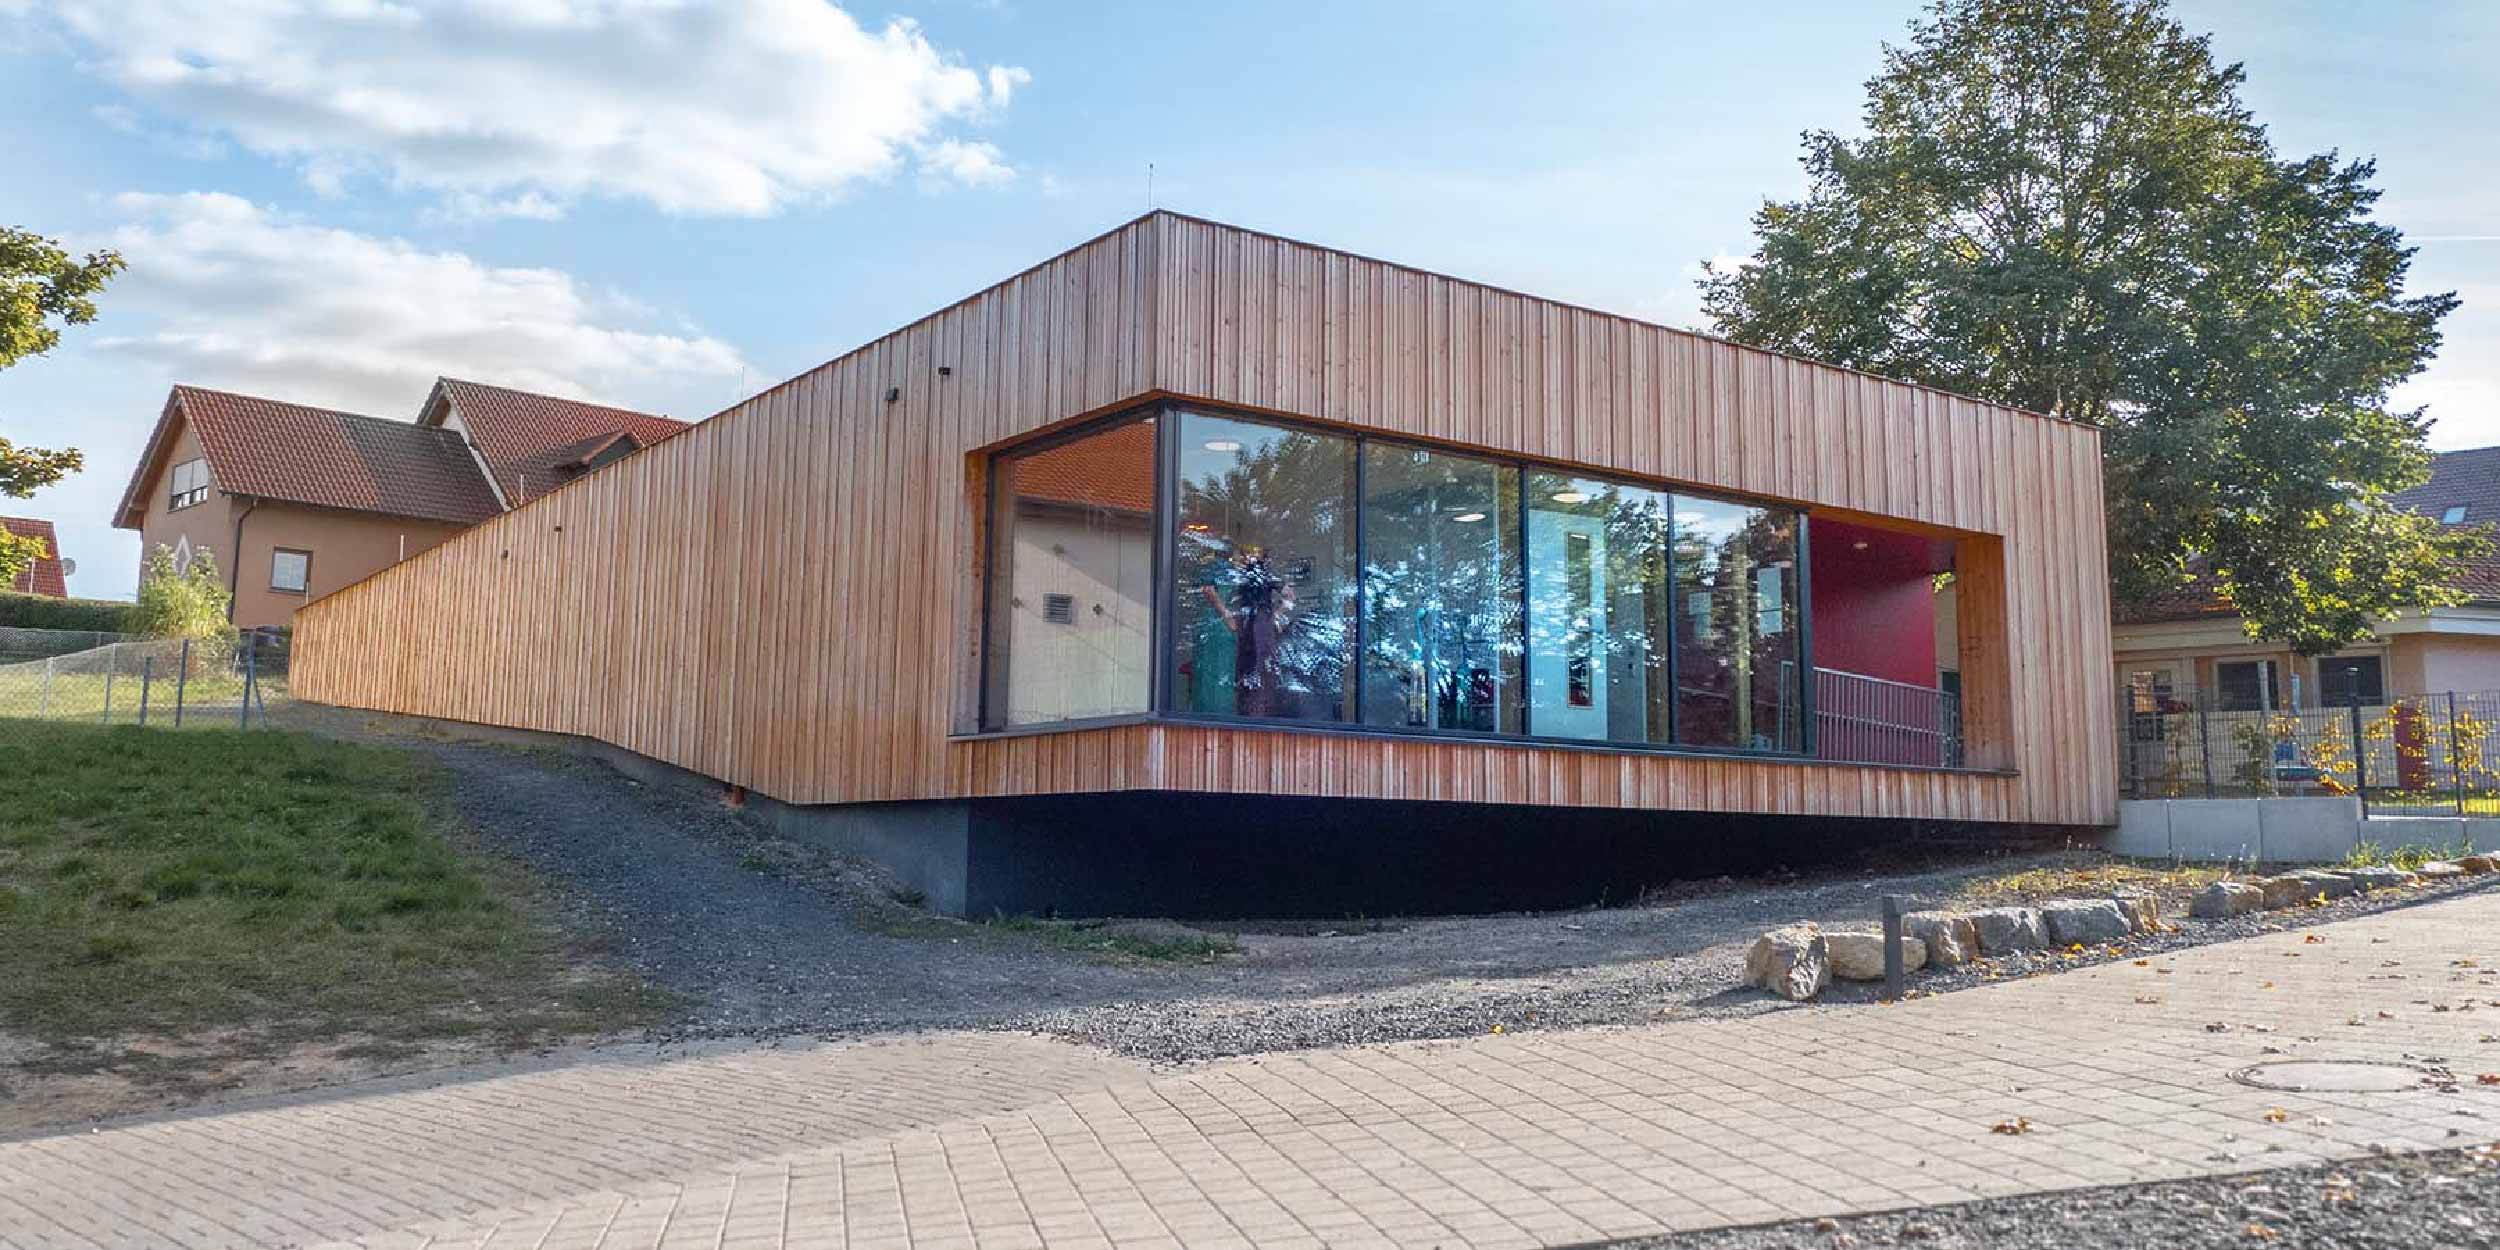 bauunternehmen_wingenfeld_gmbh_bauen_fulda_bad_salzschlirf_kindergarten_anbau